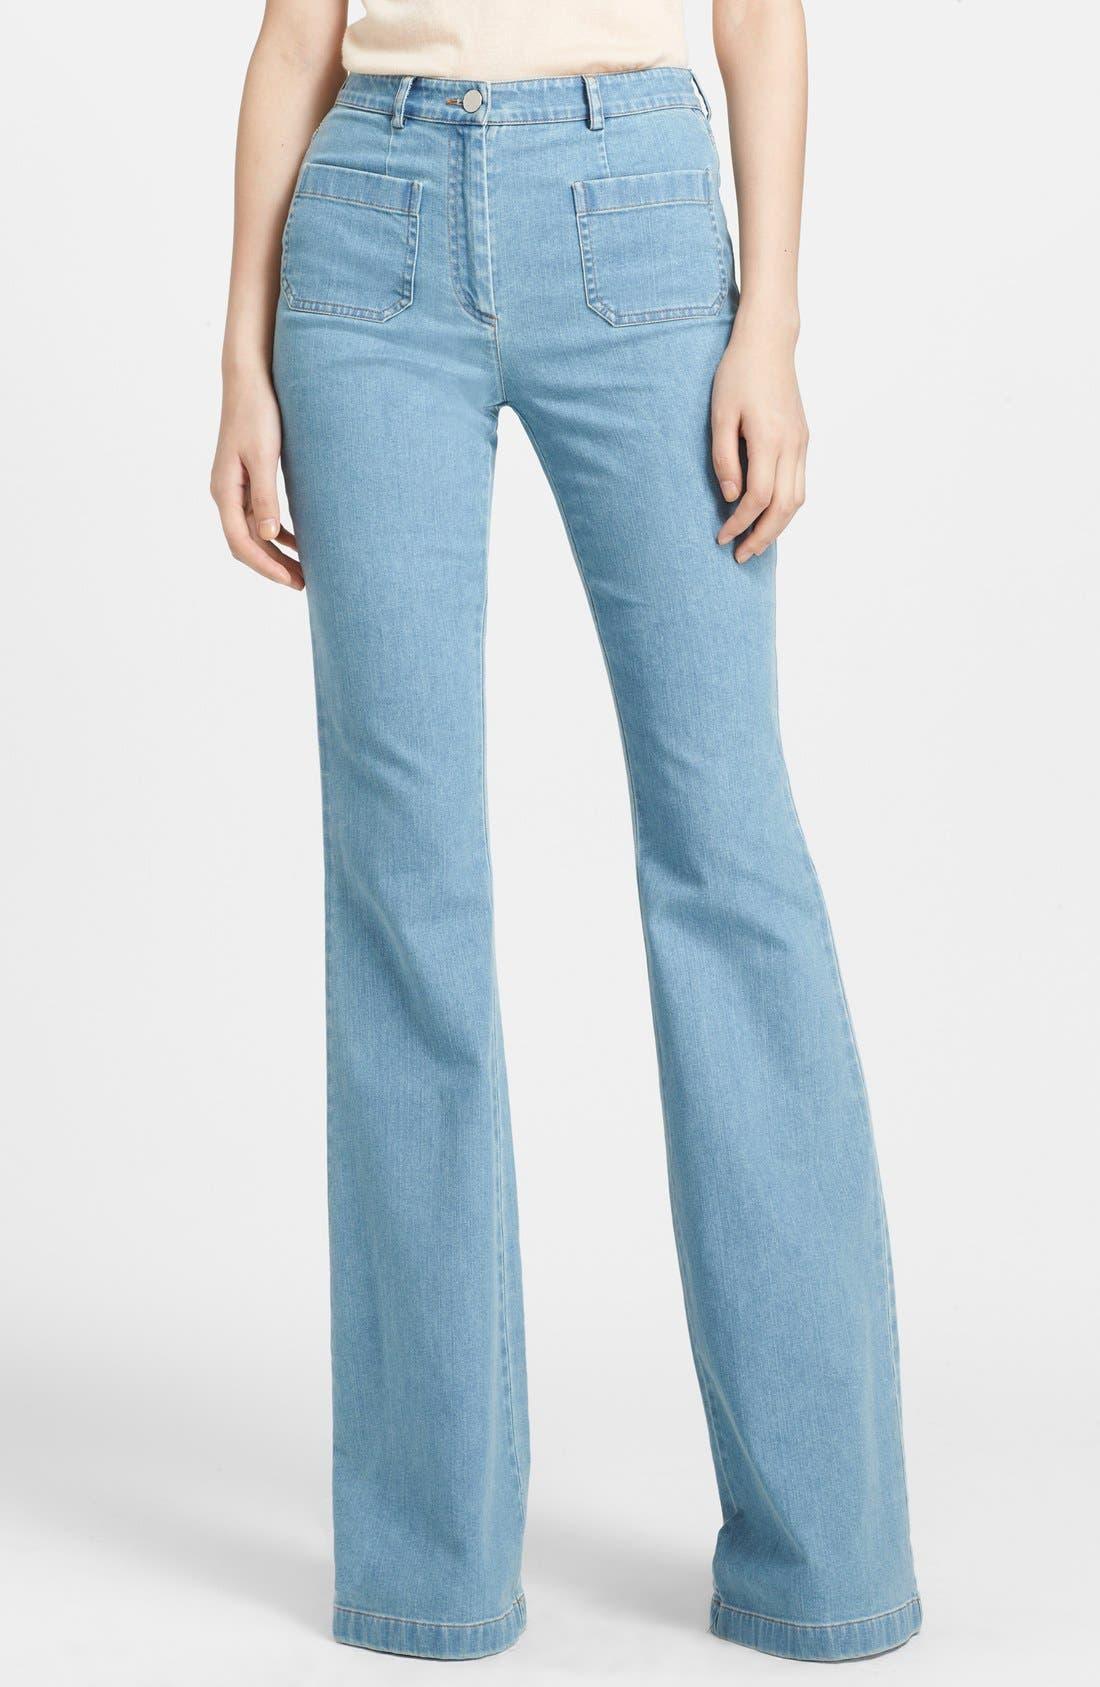 Main Image - Michael Kors Bell Bottom Stretch Jeans